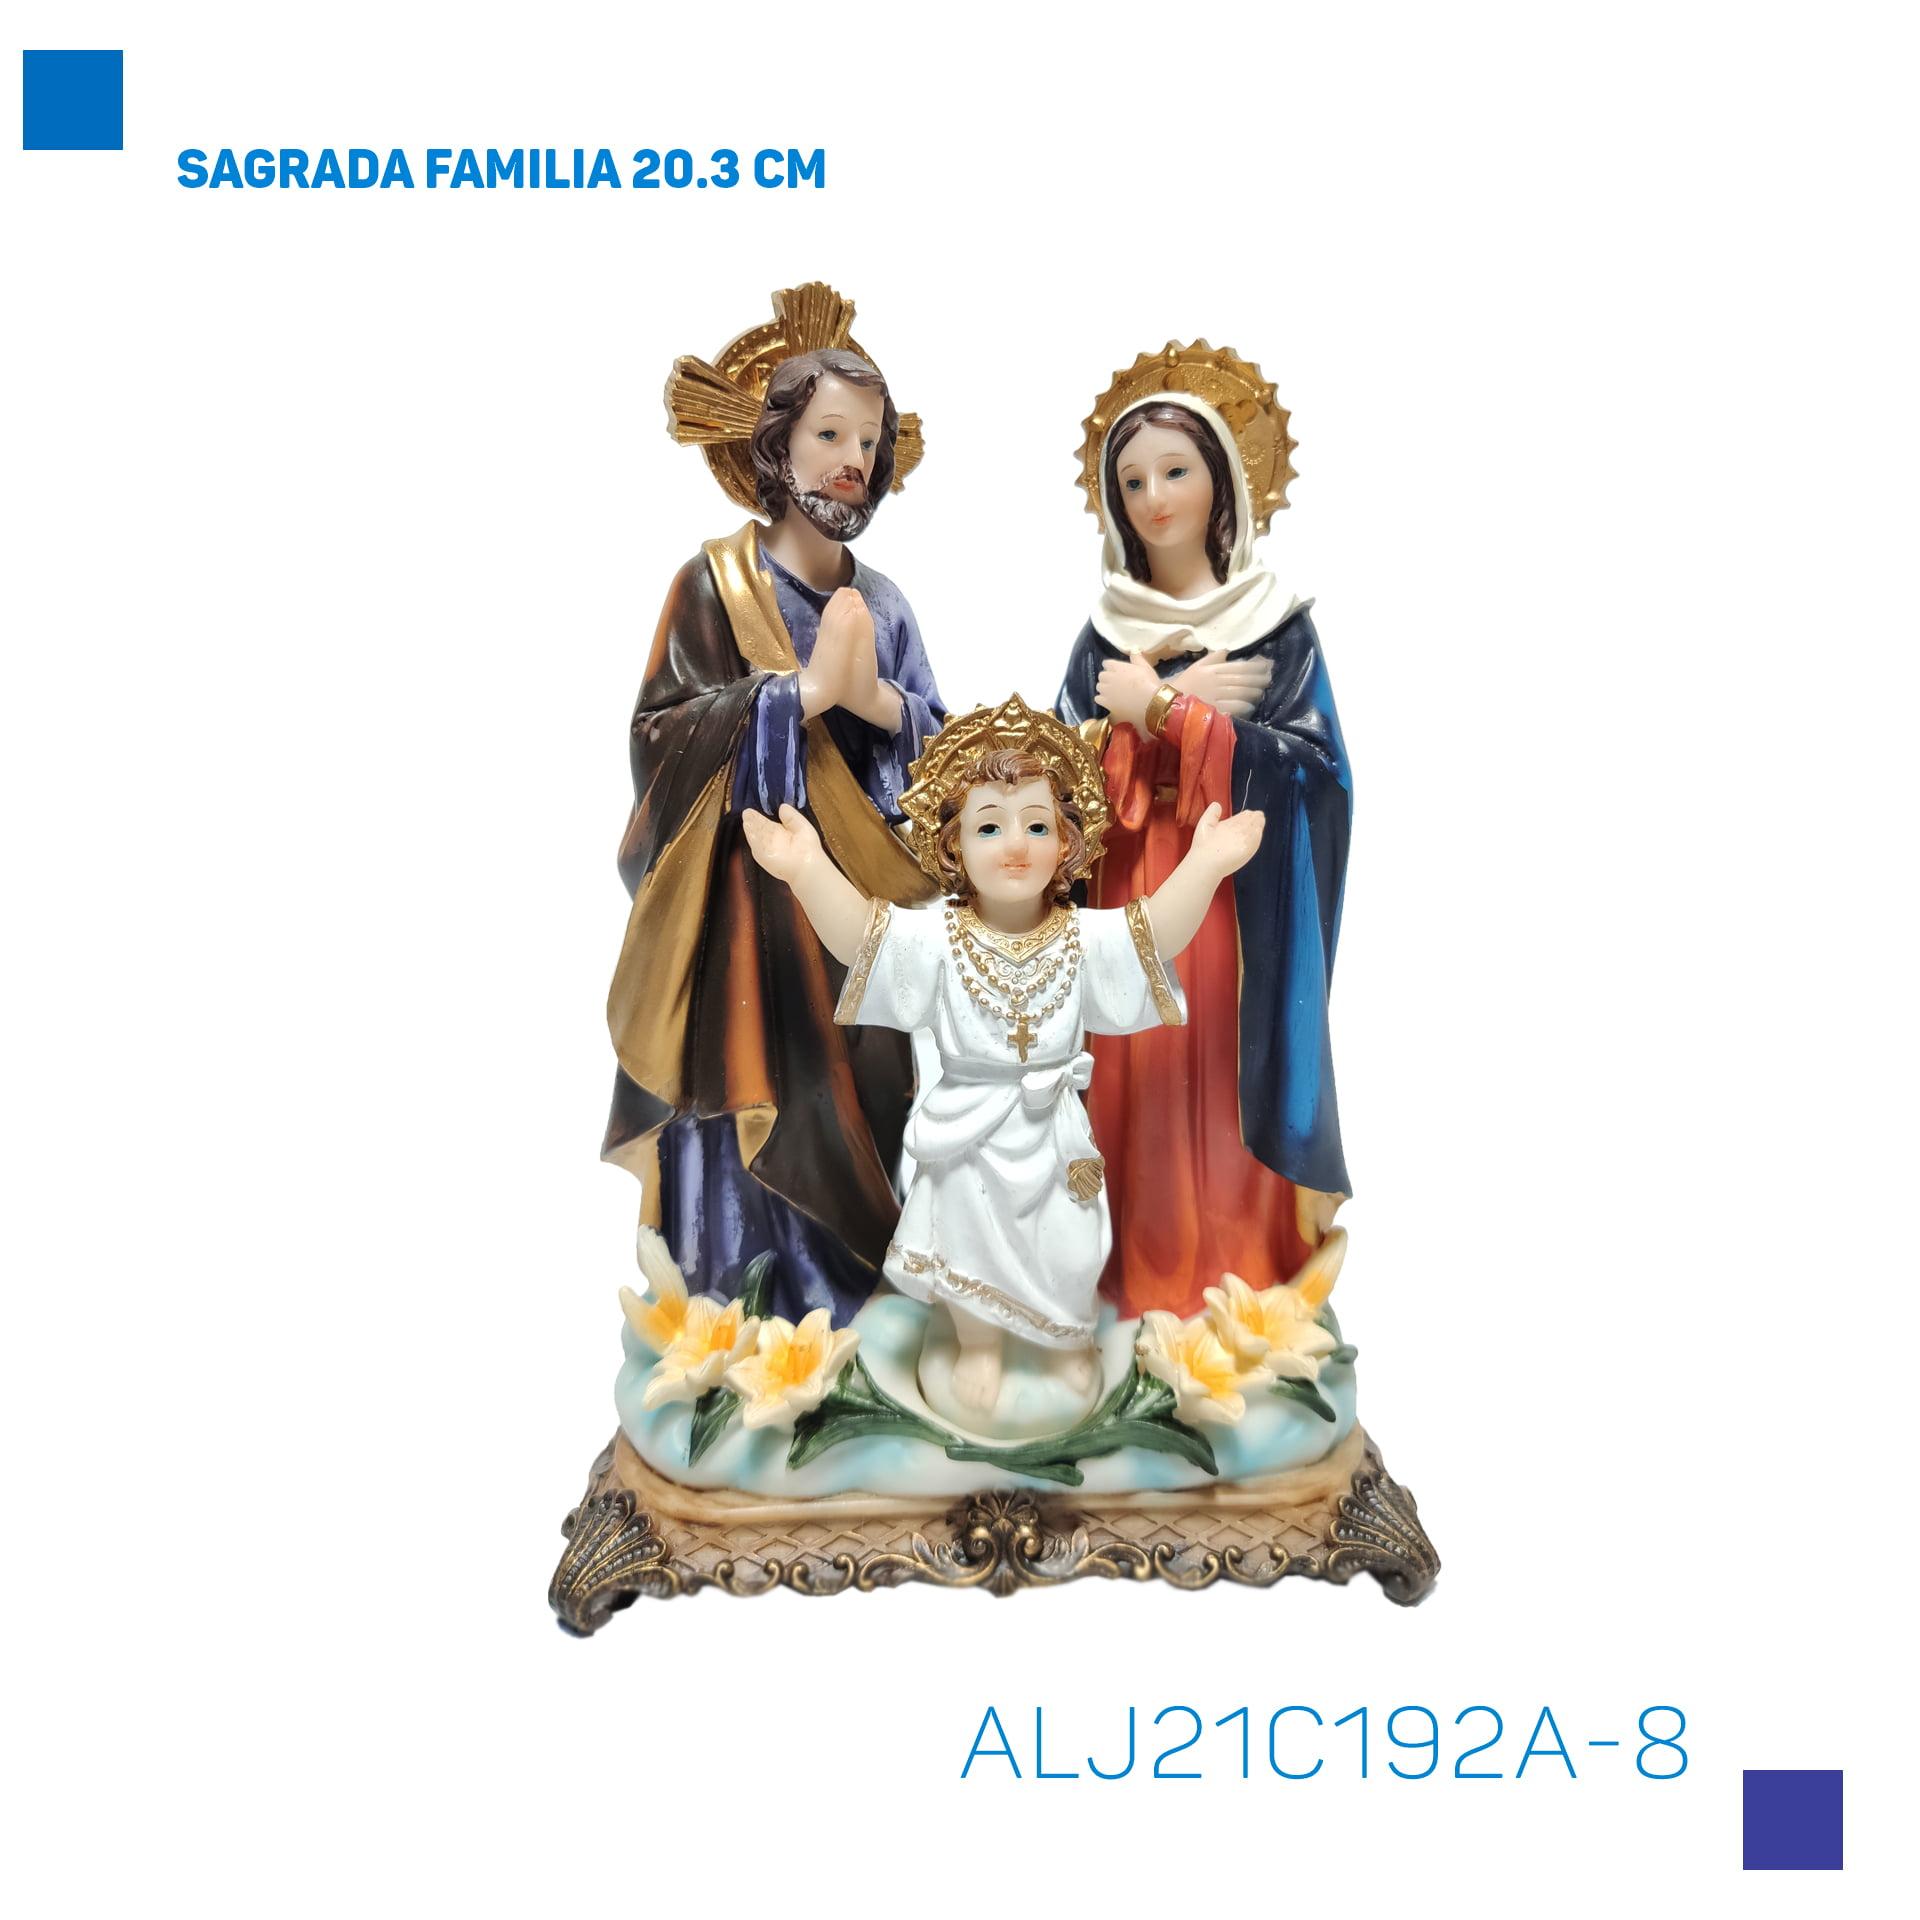 Bira Artigos Religiosos - SAGRADA FAMILIA 20.3 CM - Cód. ALJ21C192A-8